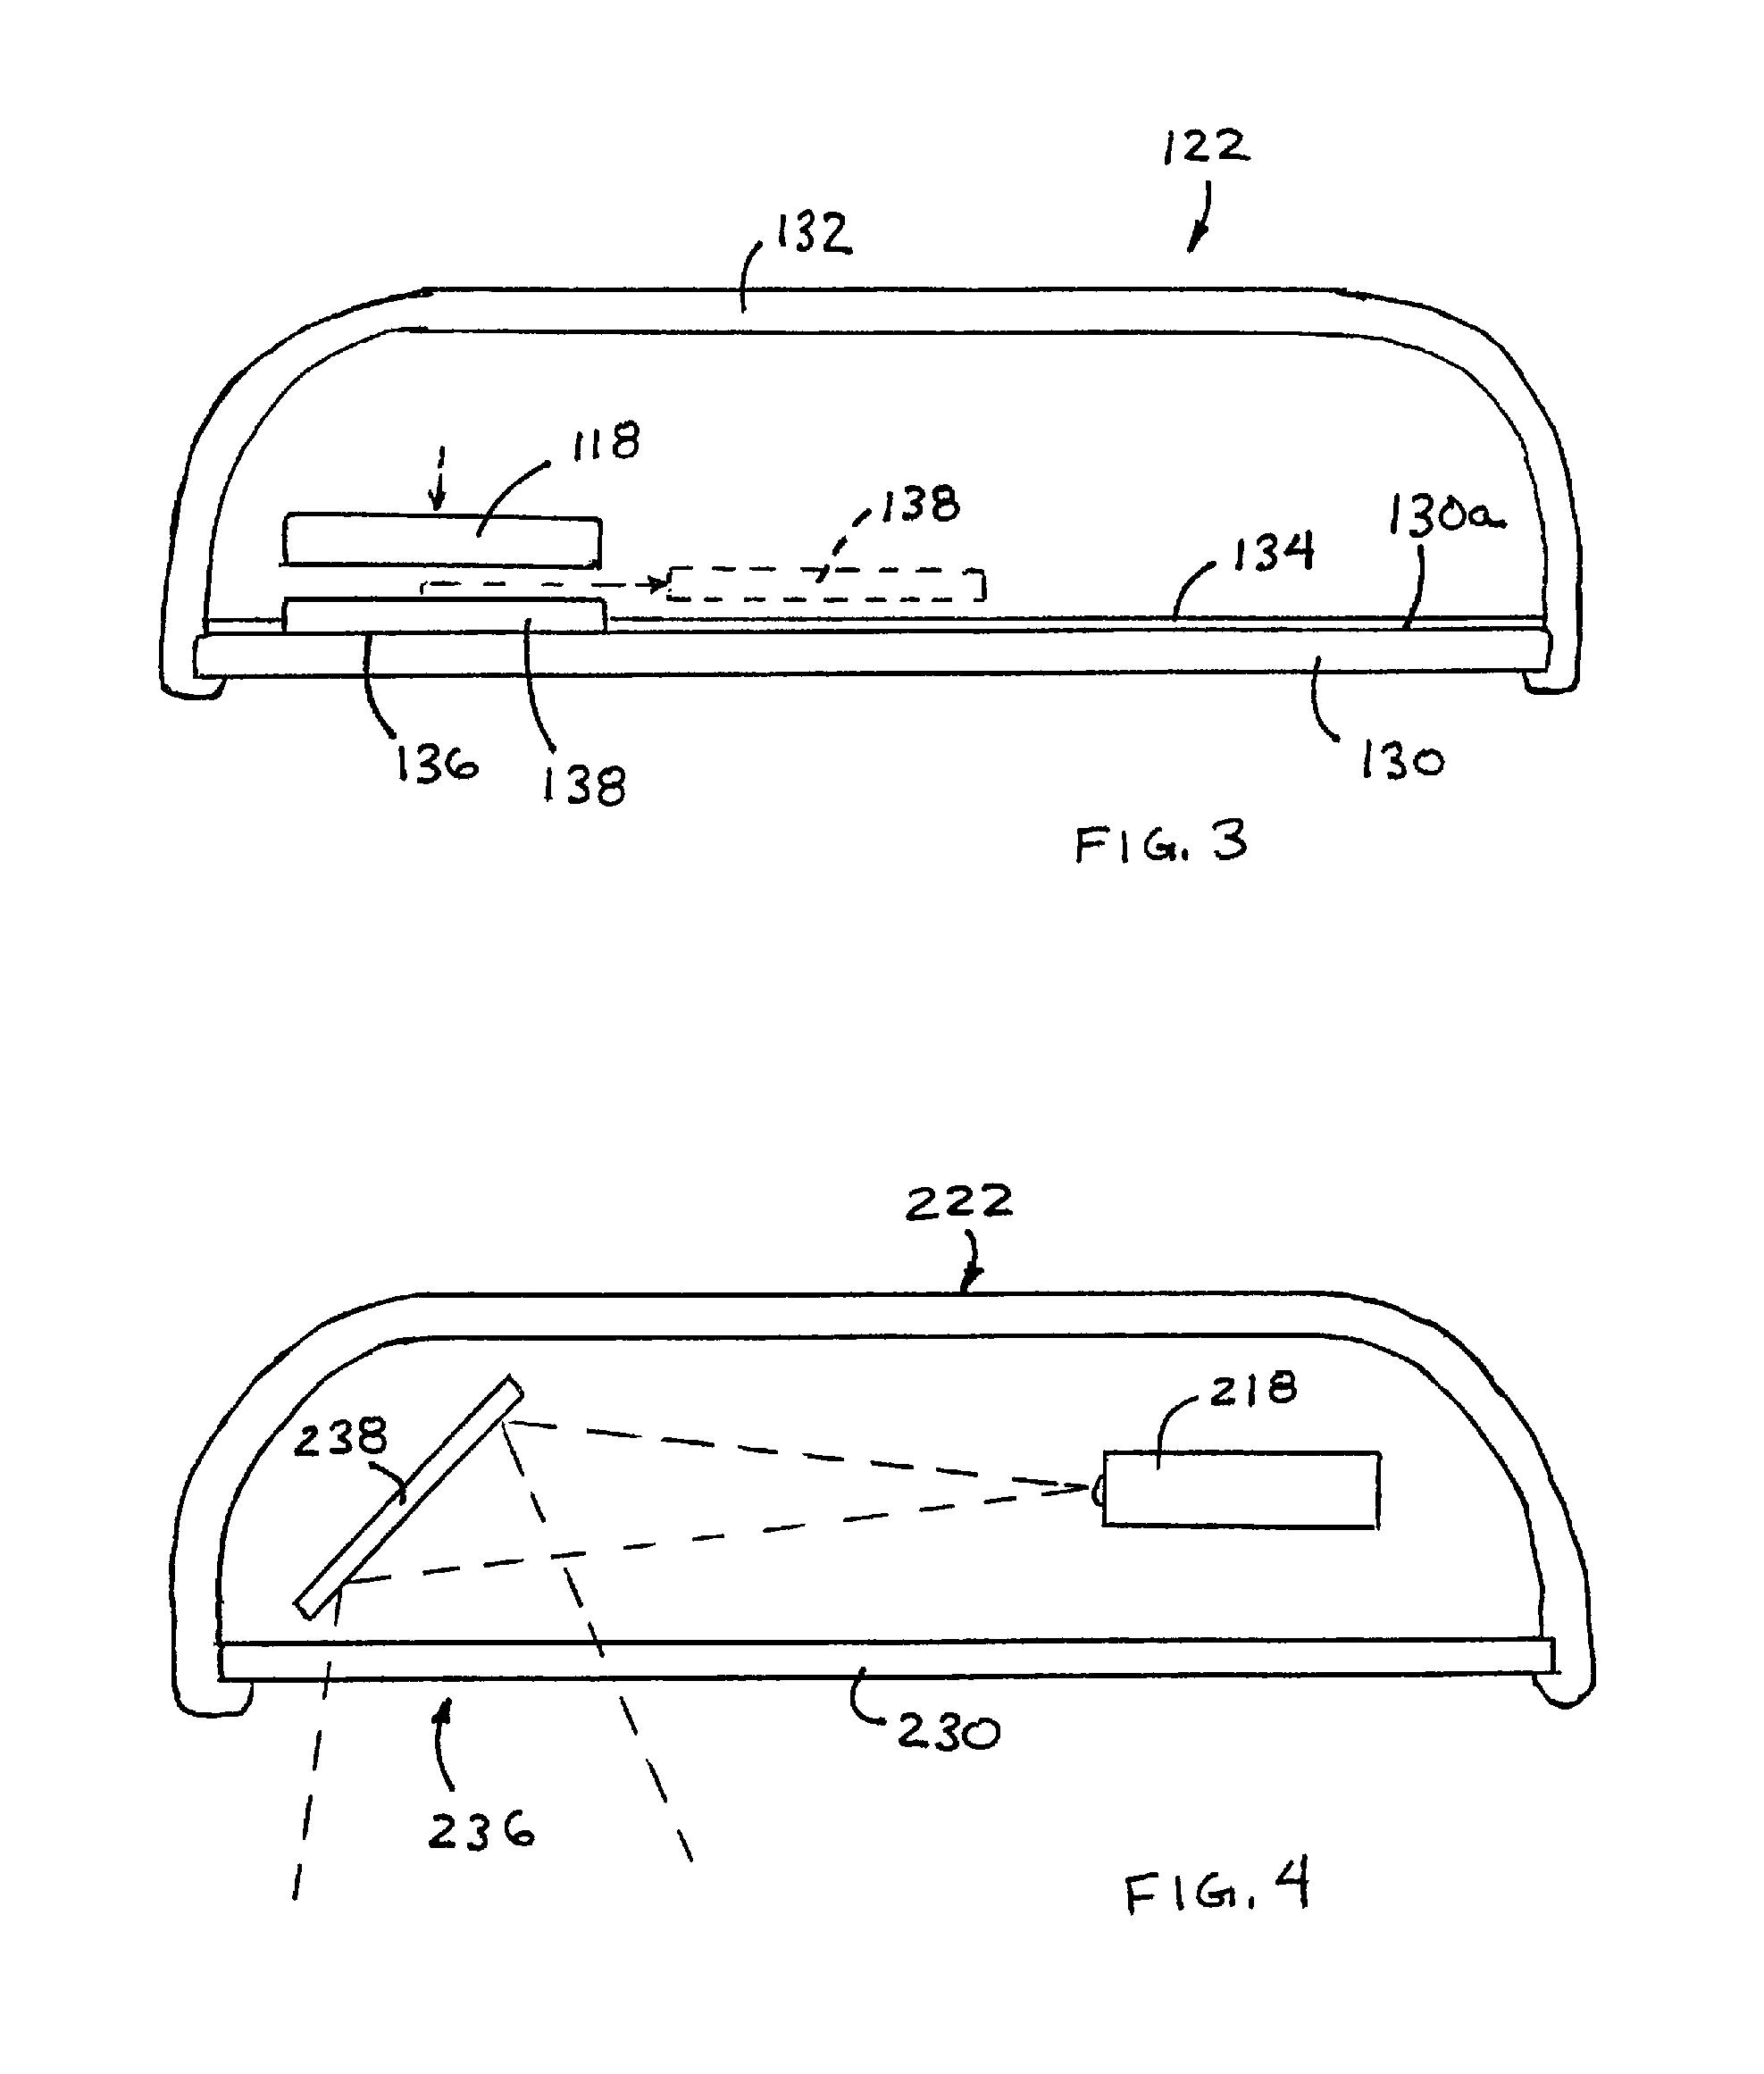 patent us 8,818,042 b2patent images · patent images · patent images